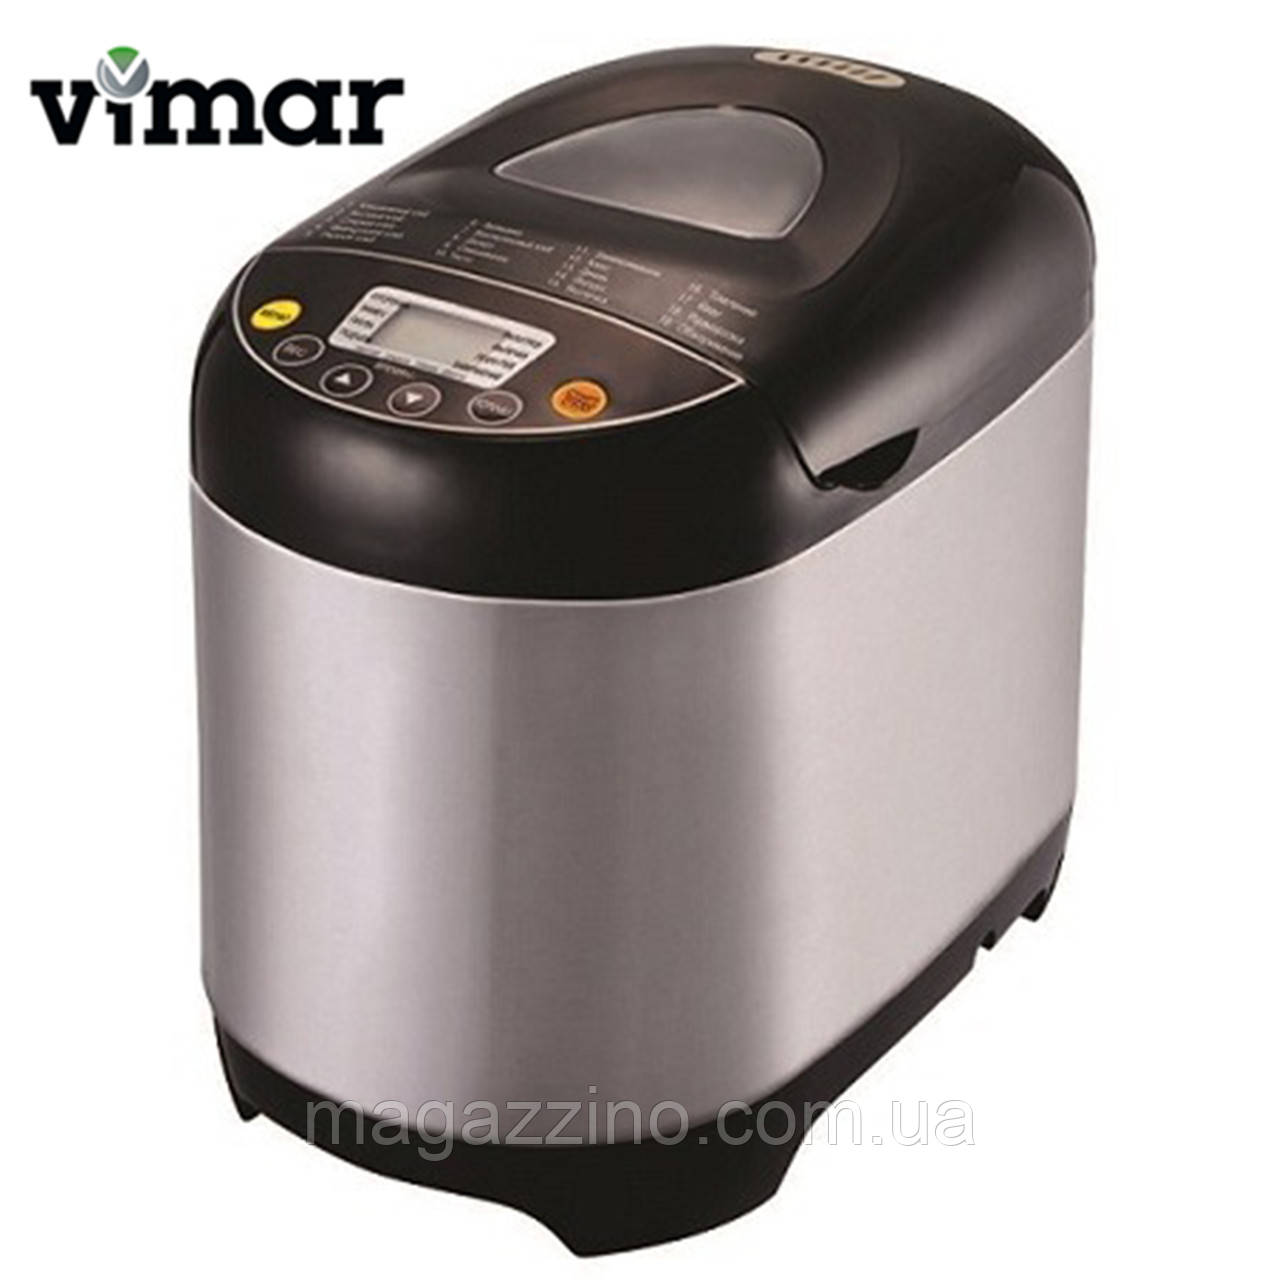 Електрична плита настільна хлібопічка, Vimar VBM-685, 550 Вт.